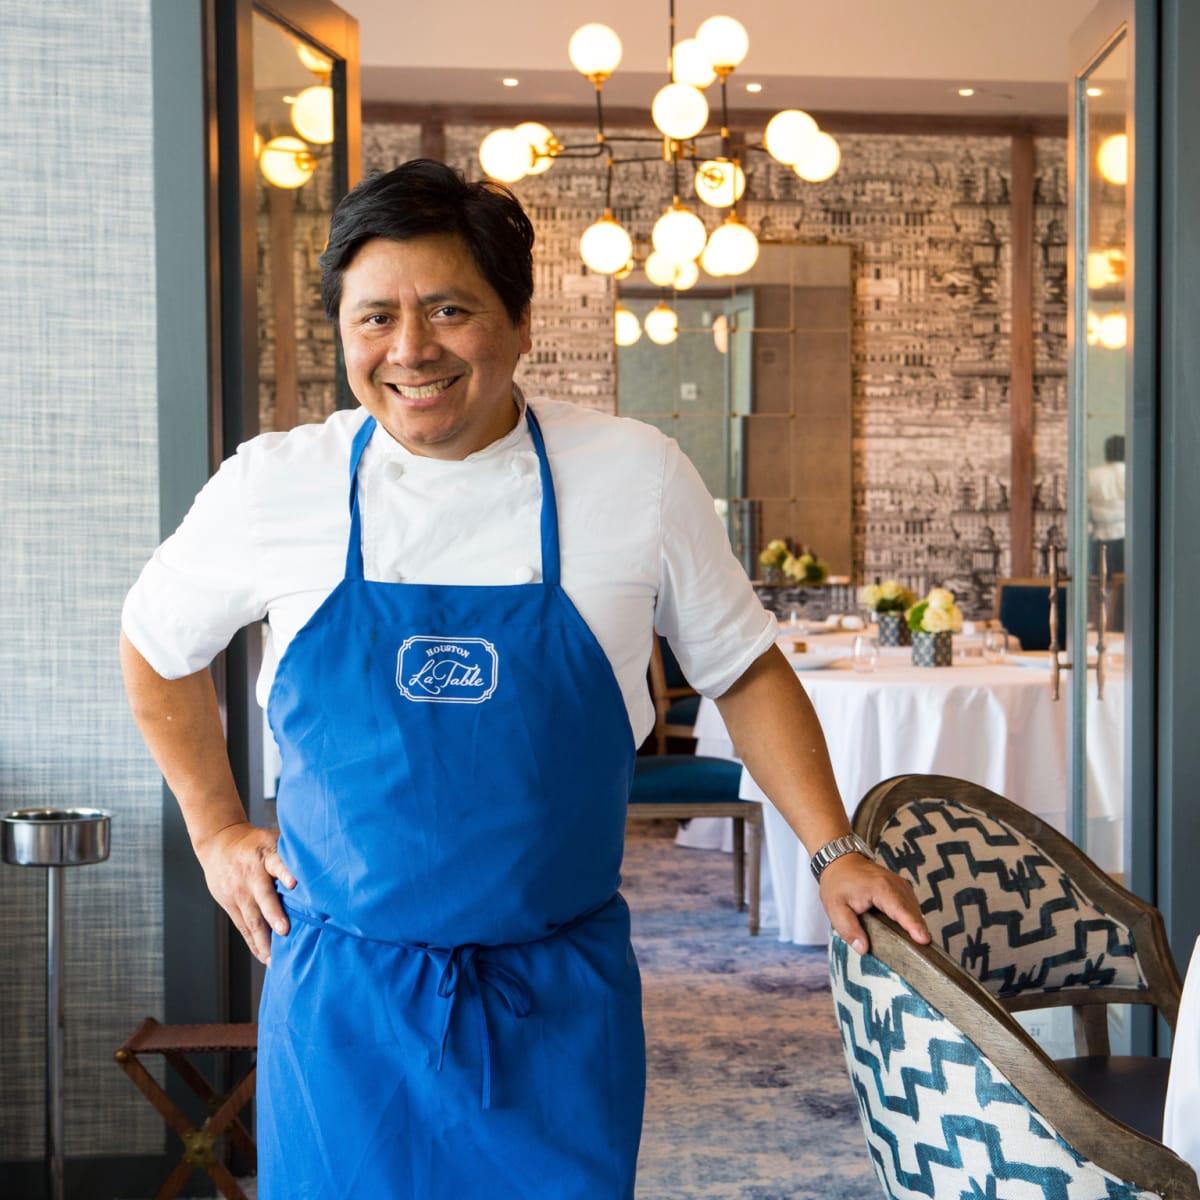 Otto Sanchez La Table pastry chef